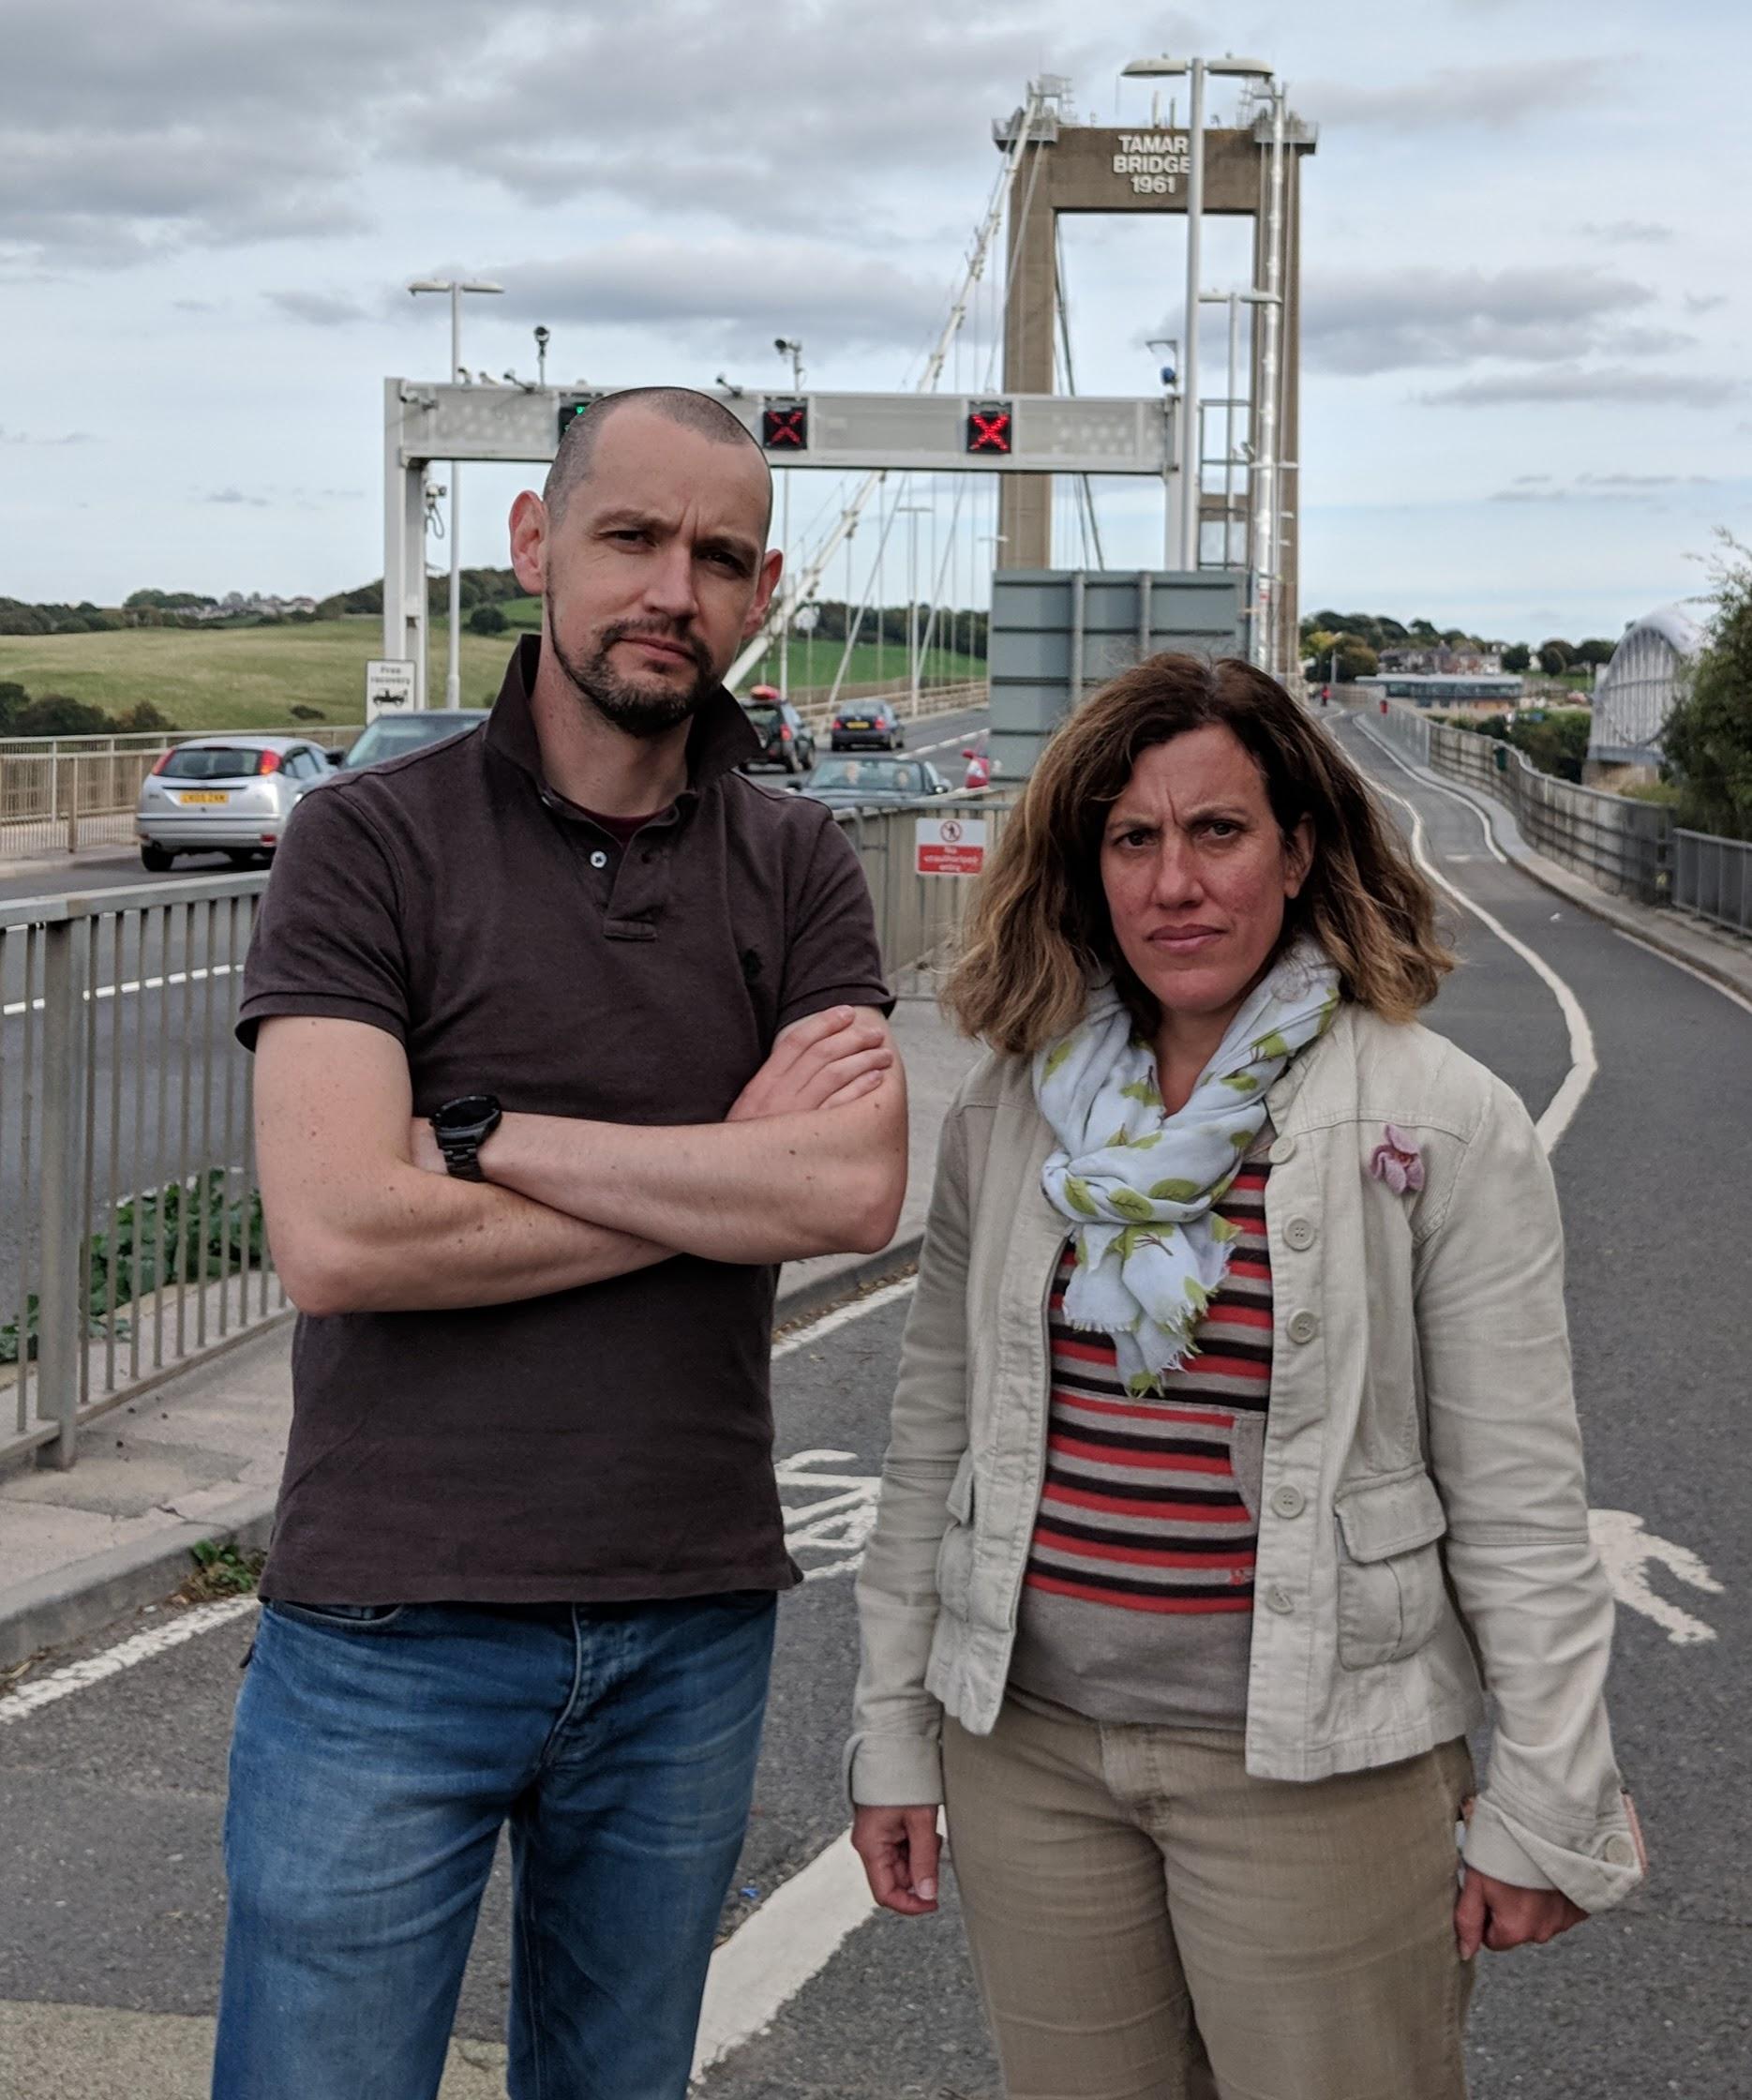 Lib Dems campaigners on the Tamar Bridge